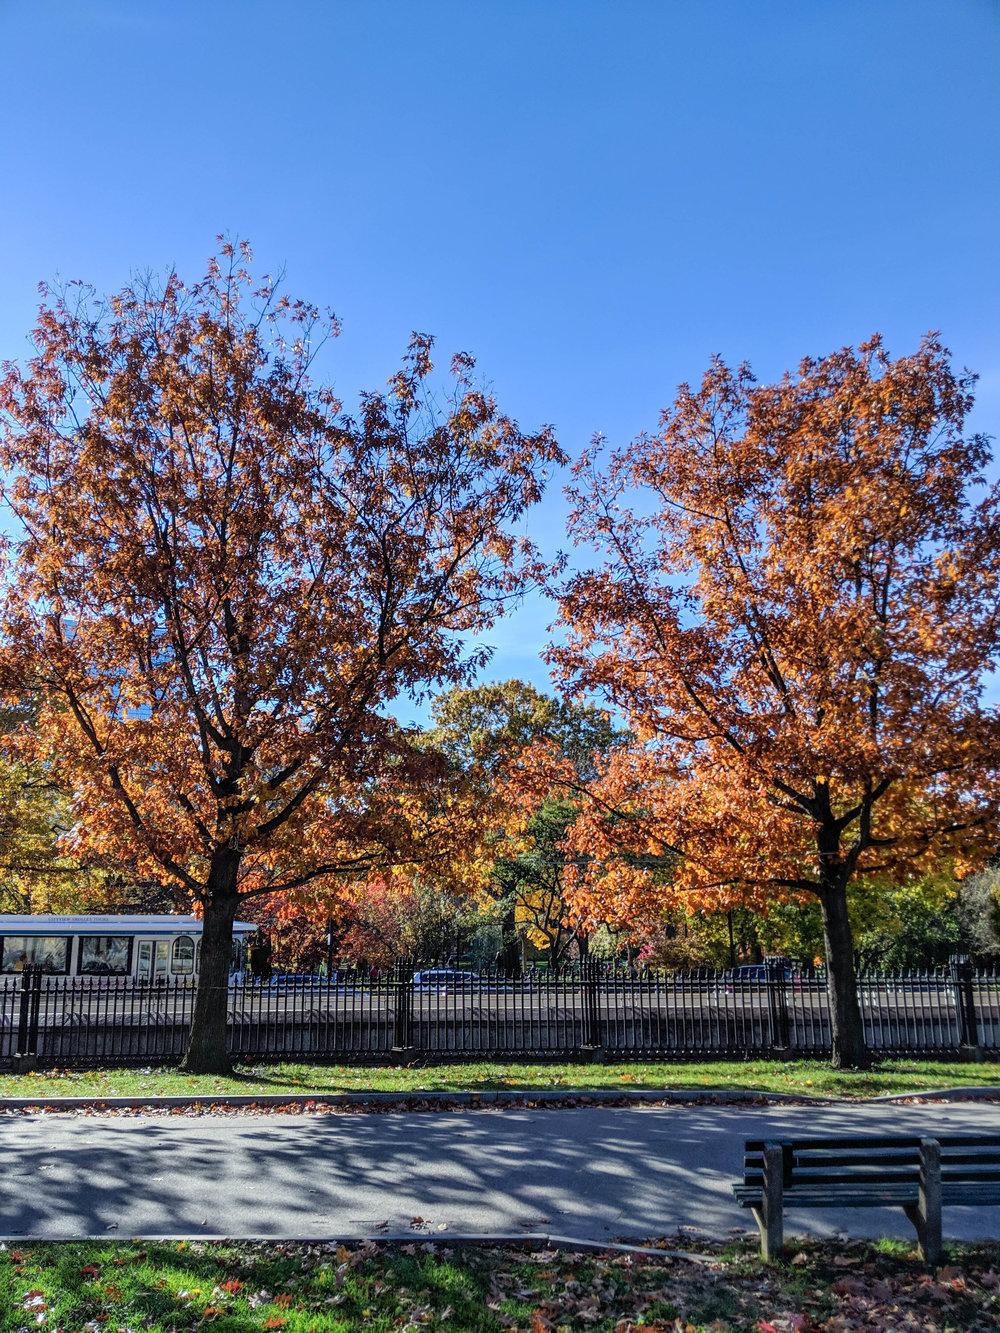 bri rinehart; photography; boston; trees; fall; nature